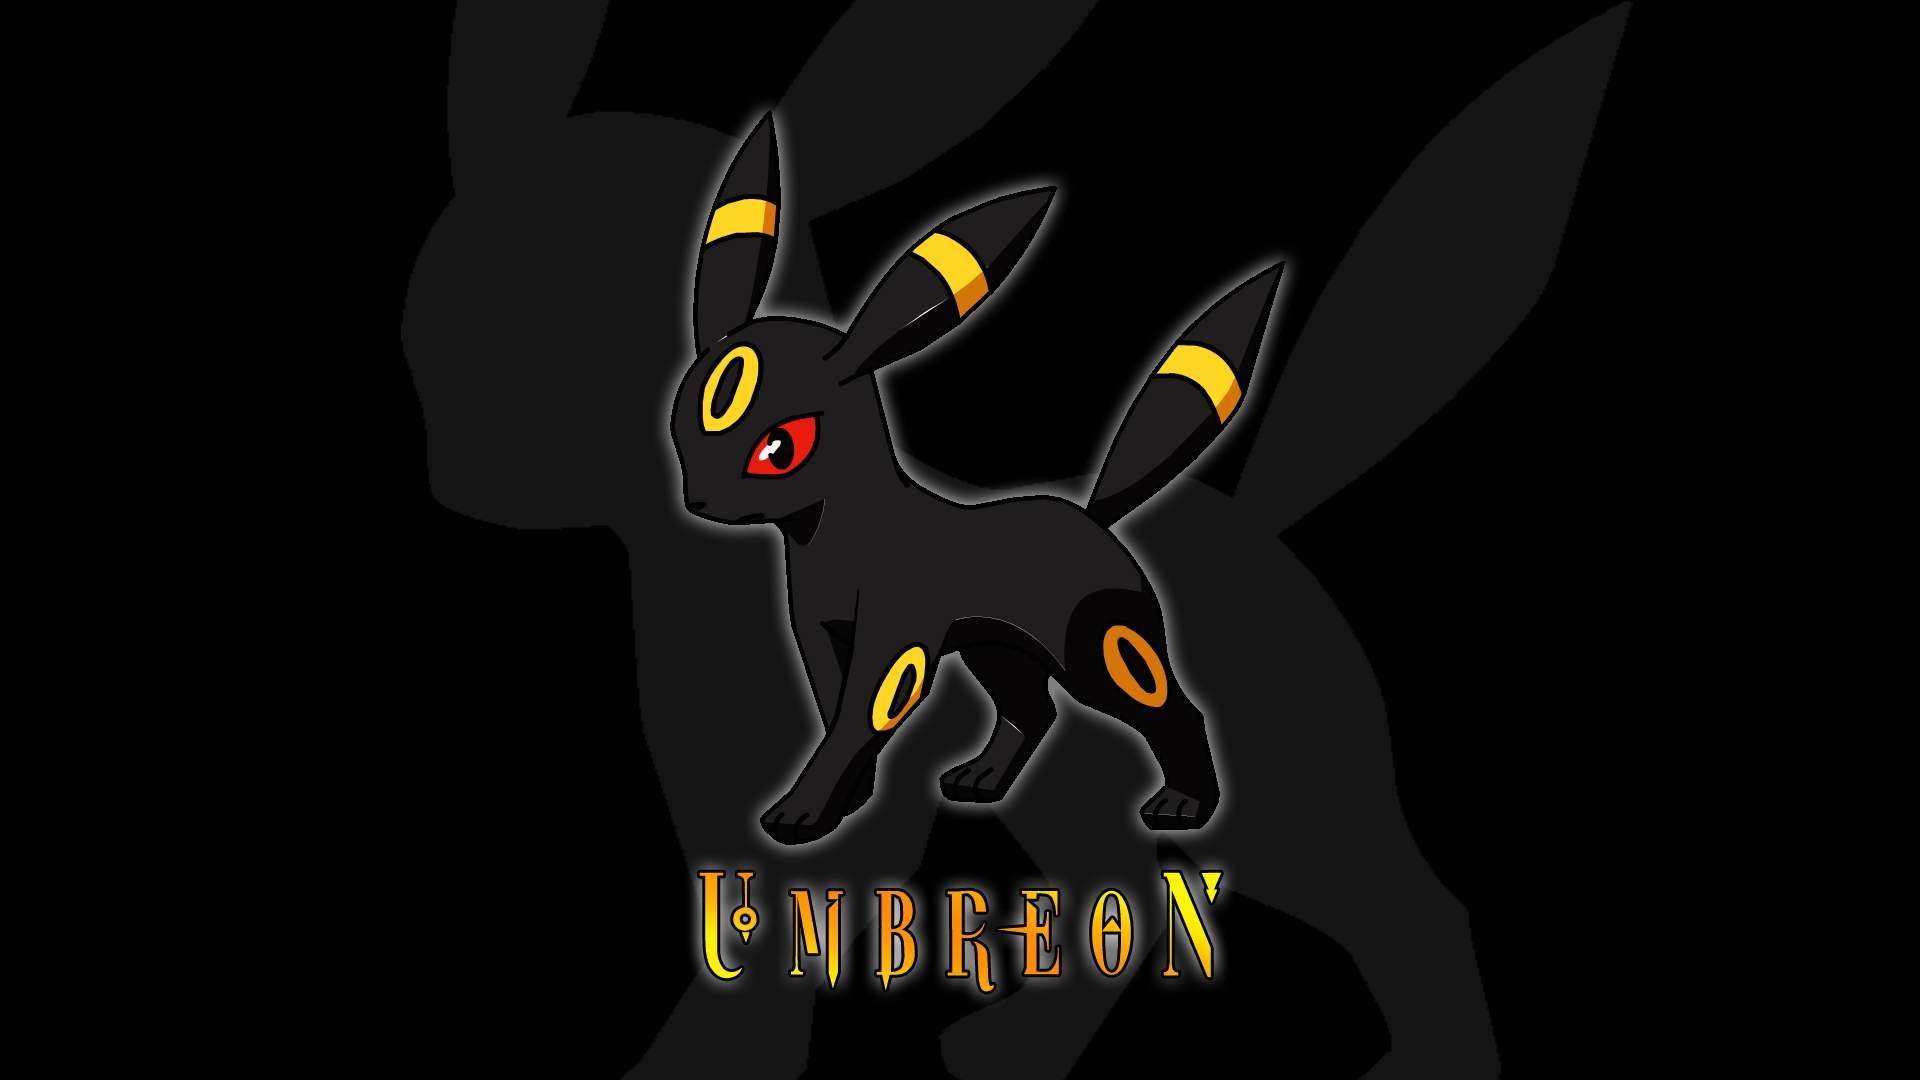 Pokemon Umbreon wallpaper 71984 1920x1080